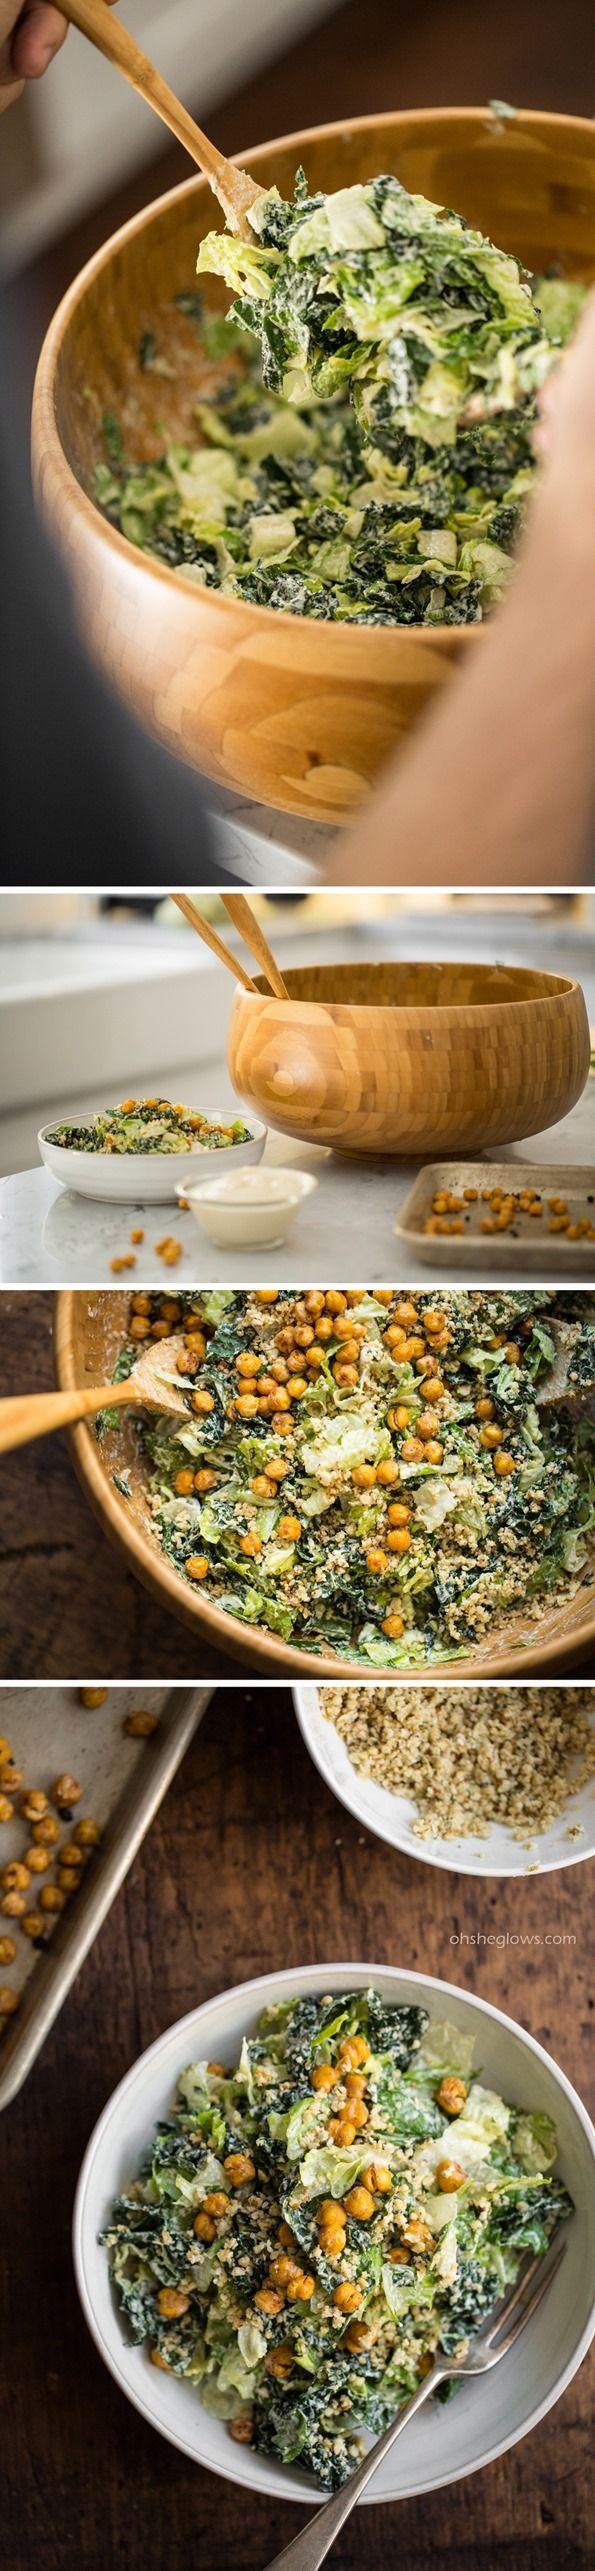 Crowd Pleasing Vegan Caesar Salad by ohsheglows #Salad #Caesar #Vegan #Healthy